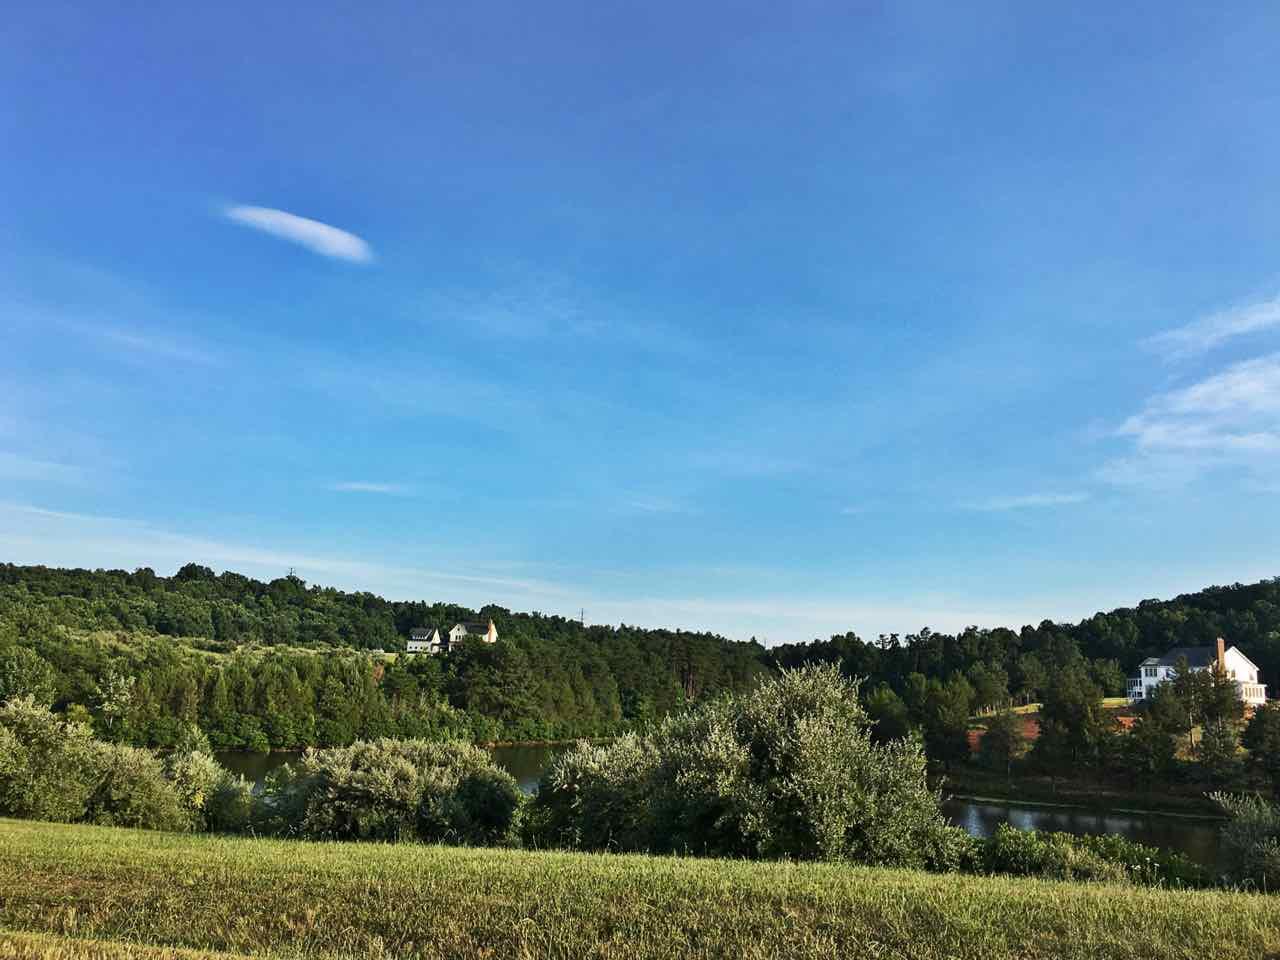 Mountain Valley Farm home nestled in the hillside